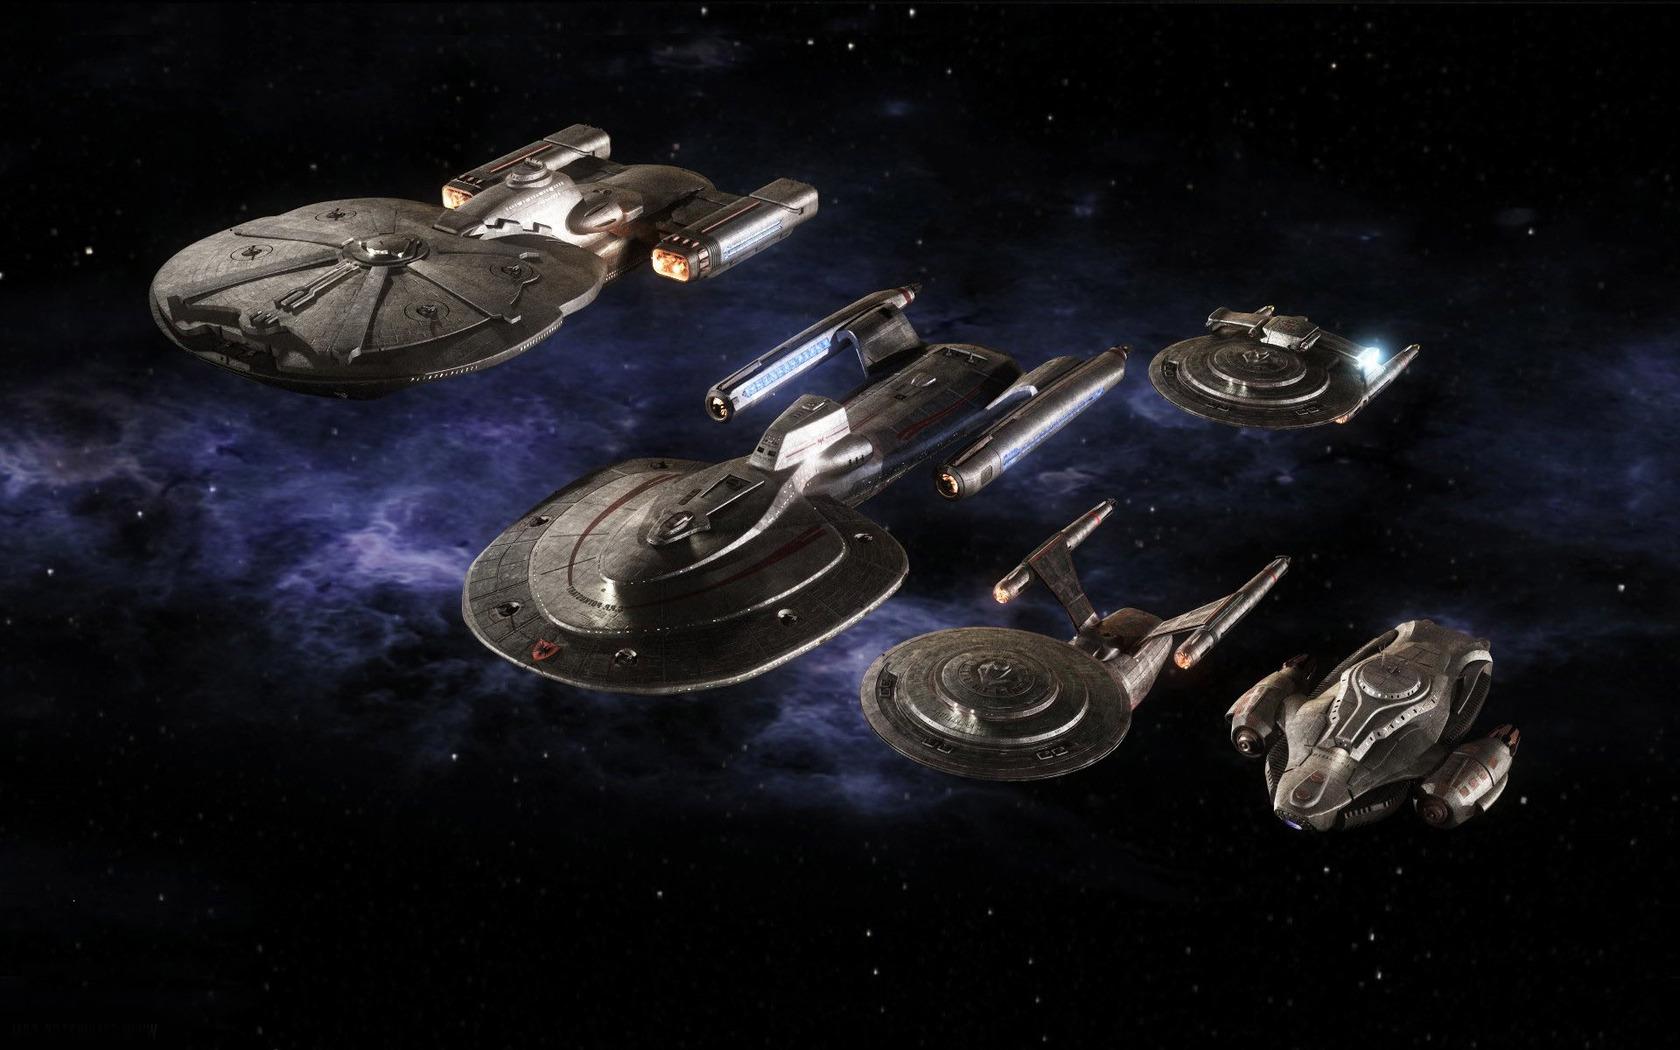 Starwreck spaceships wallpaper 3337 1680x1050